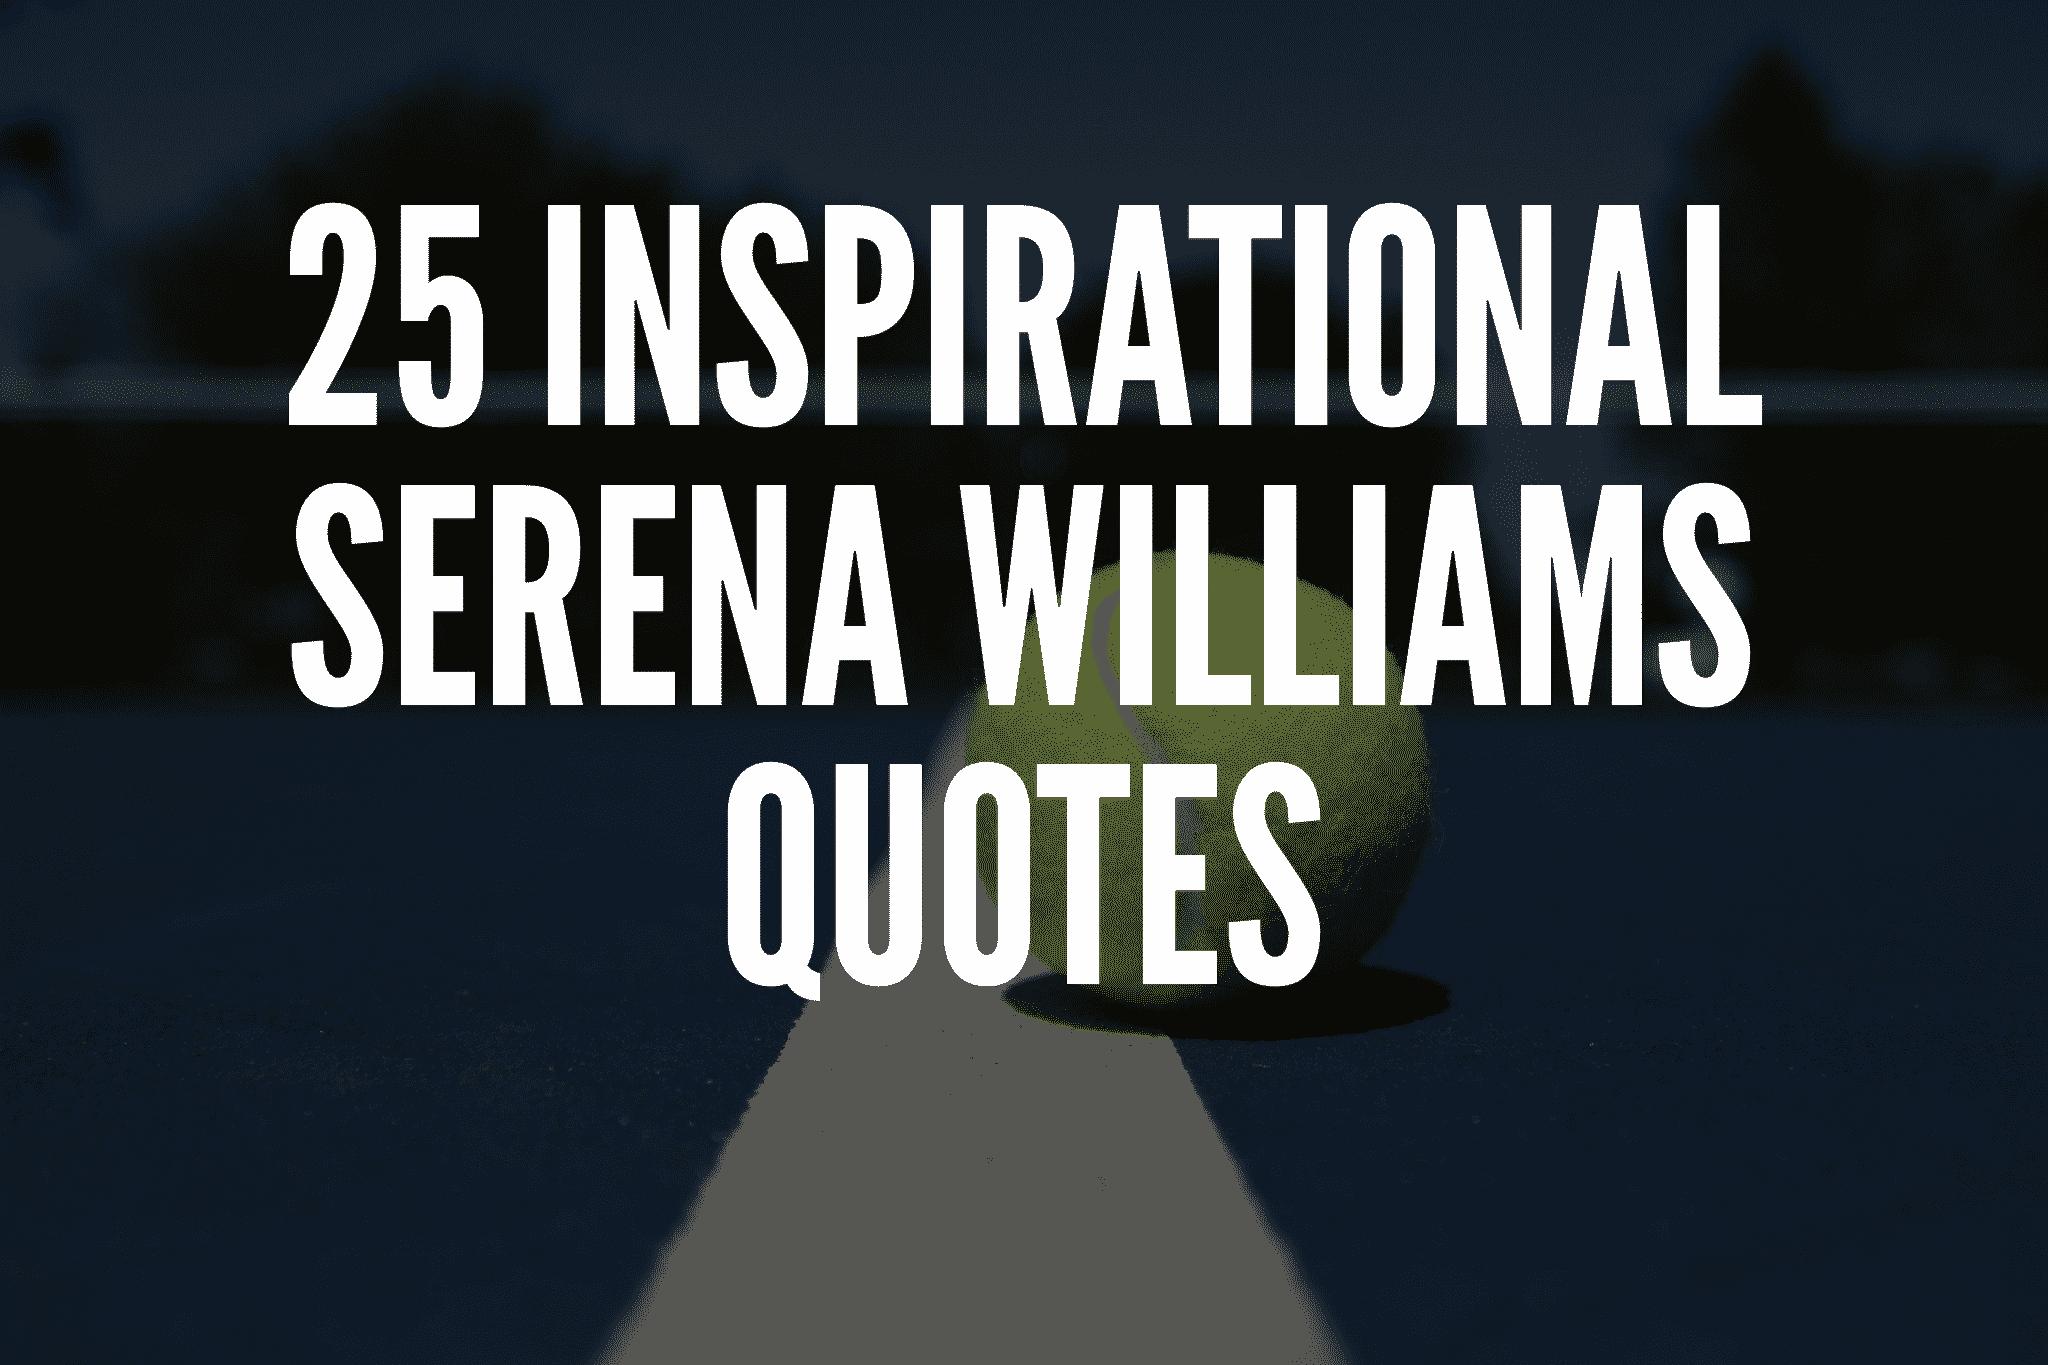 25 Inspirational Serena Williams Quotes